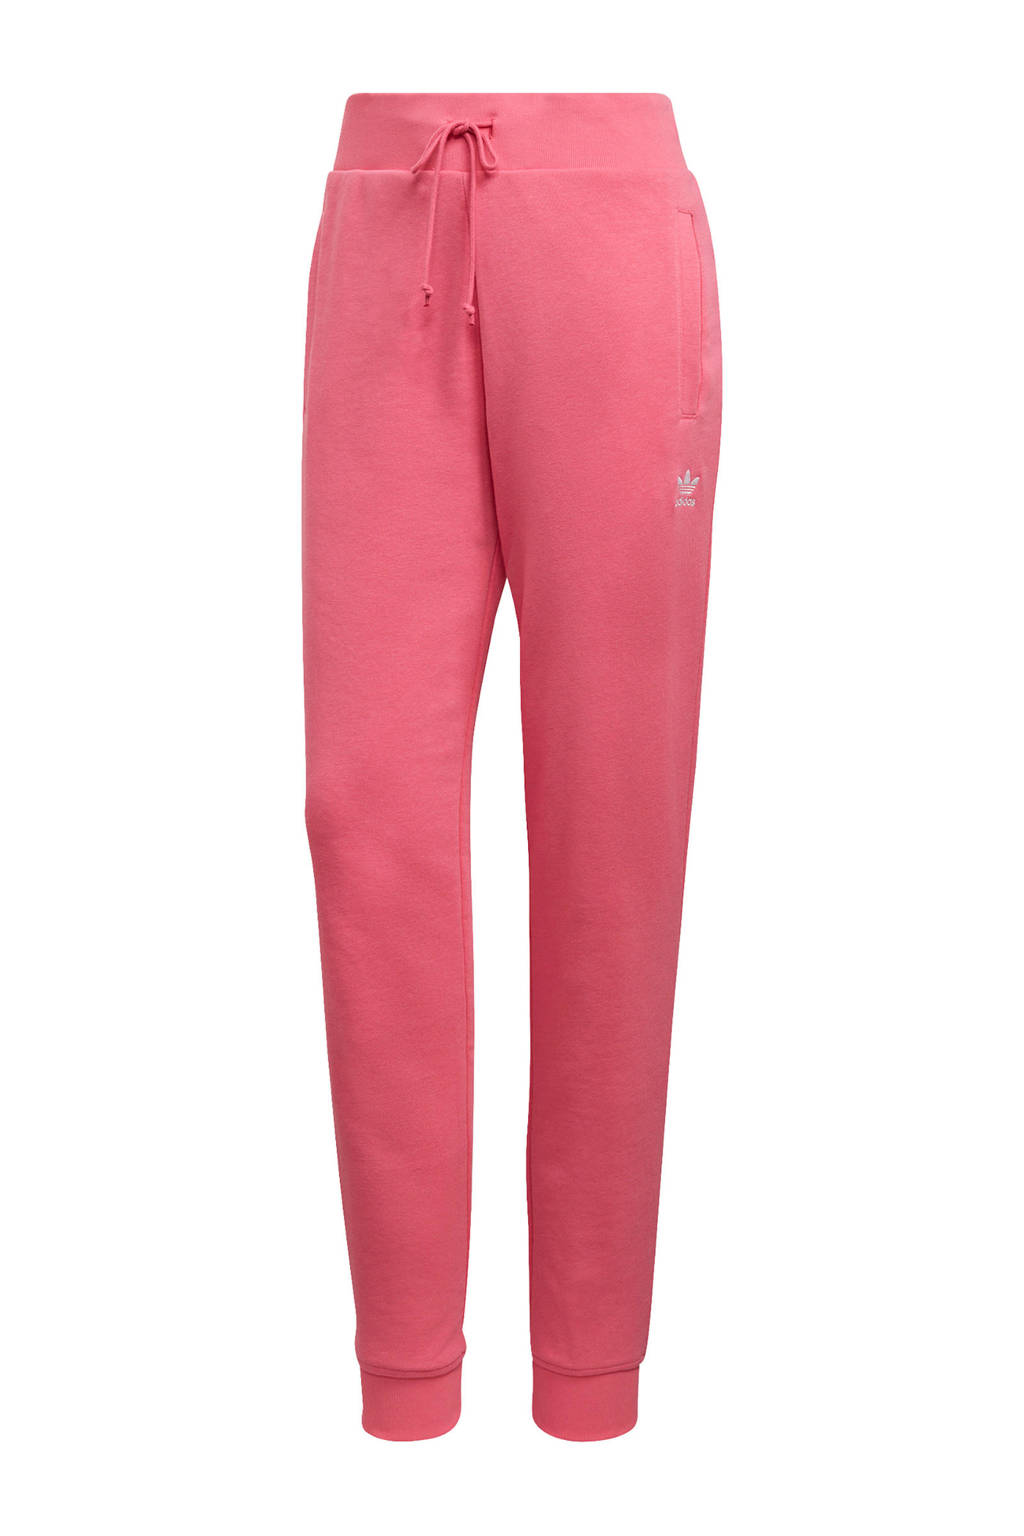 adidas Originals joggingbroek roze, Roze